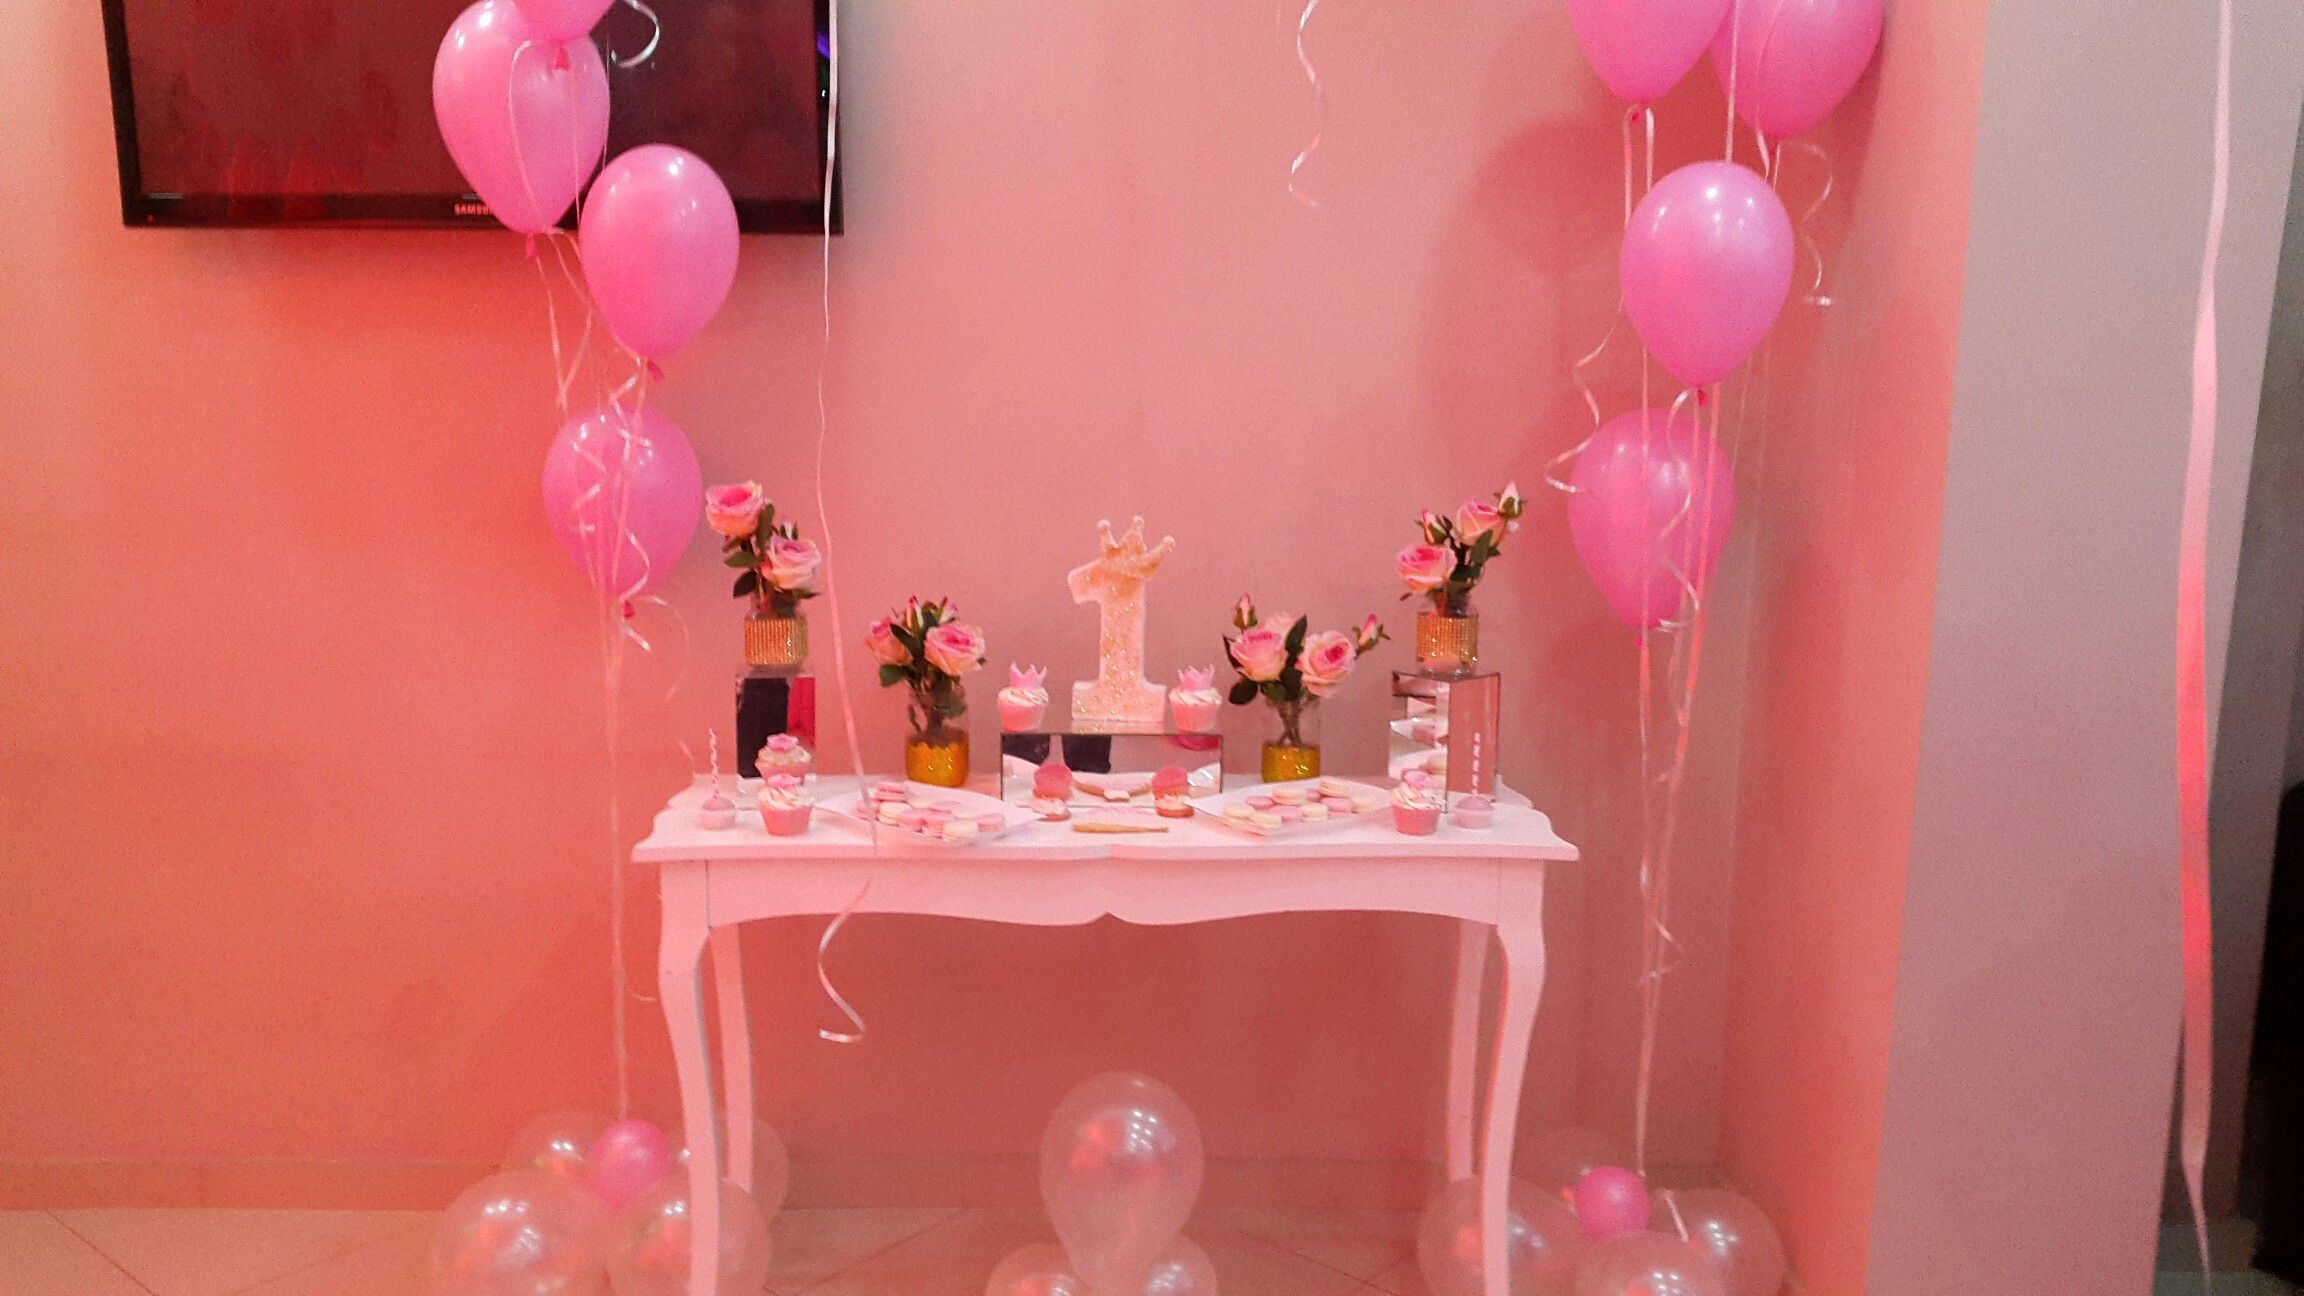 Wedding stage decoration with balloons  Pin by Sara Elbasan on wedding ideas  Pinterest  Weddings